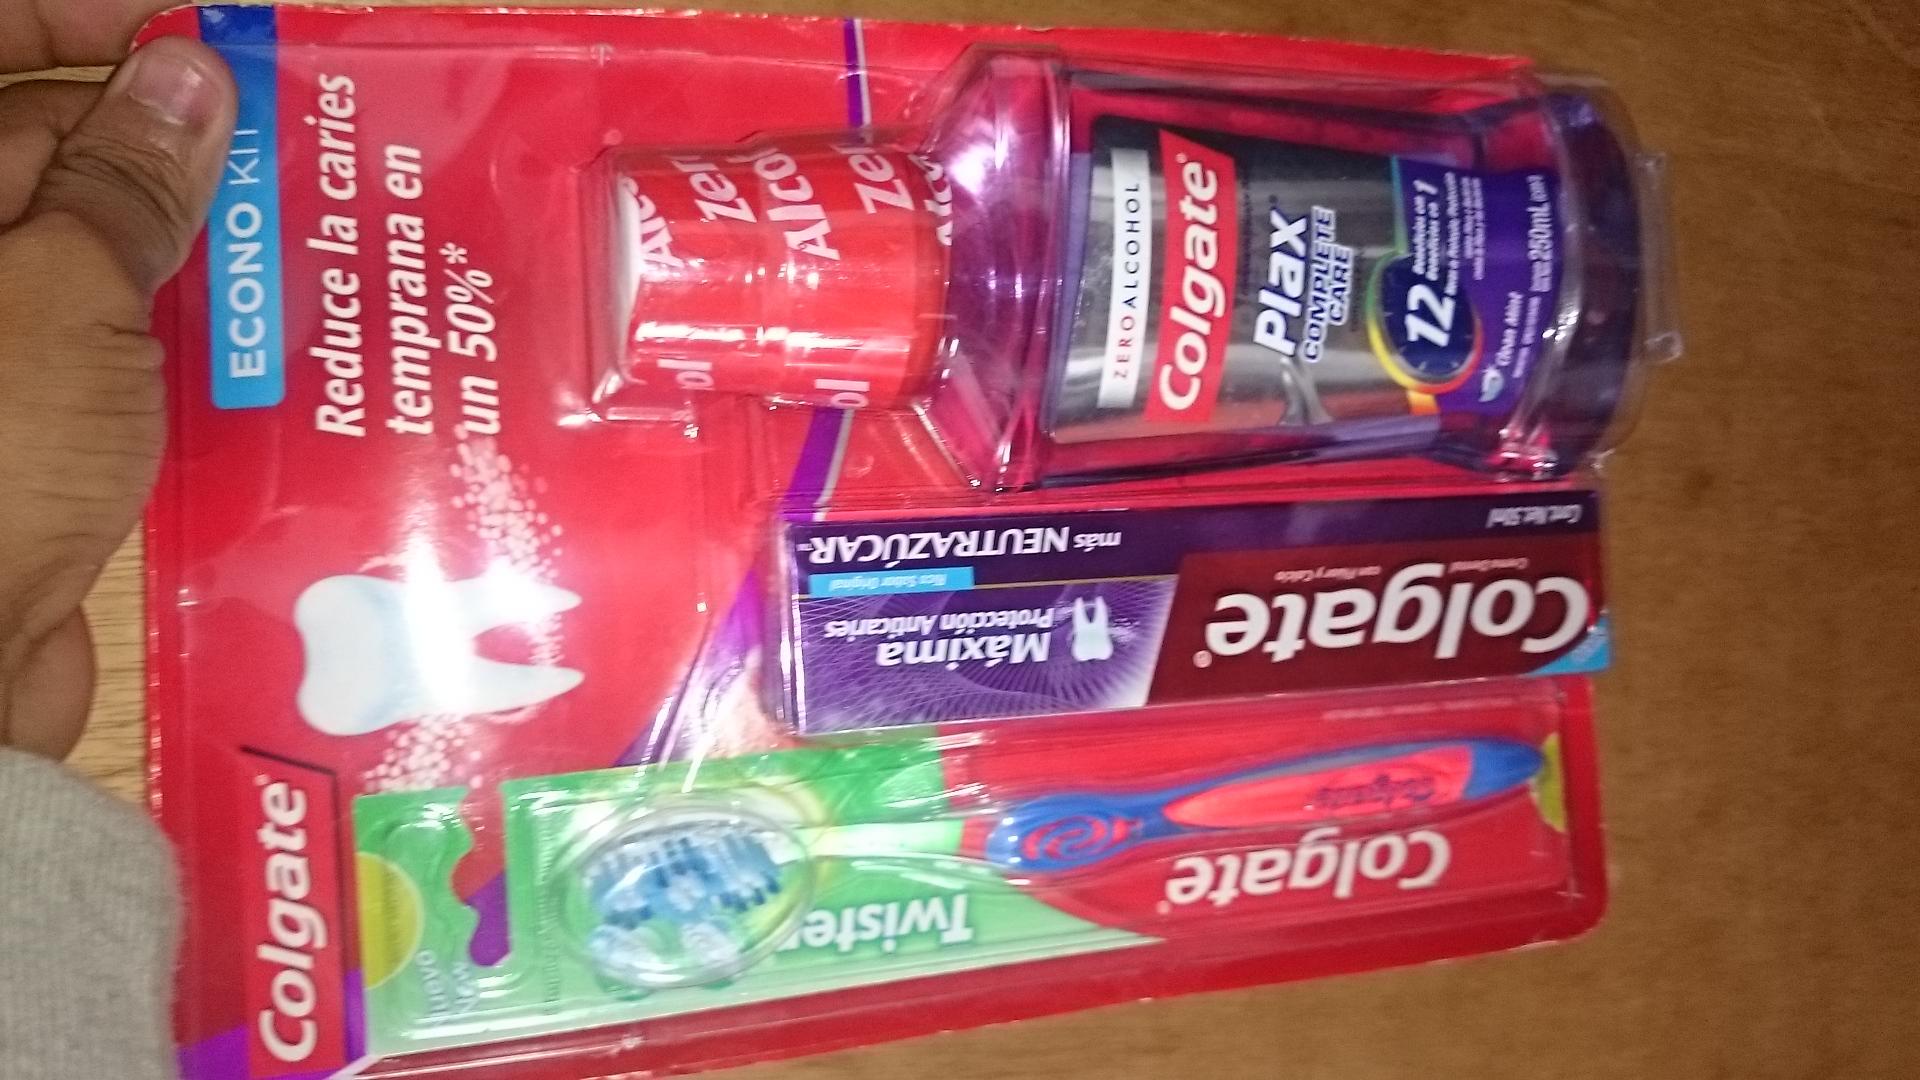 Chedraui: paquete limpieza bucal $8.10